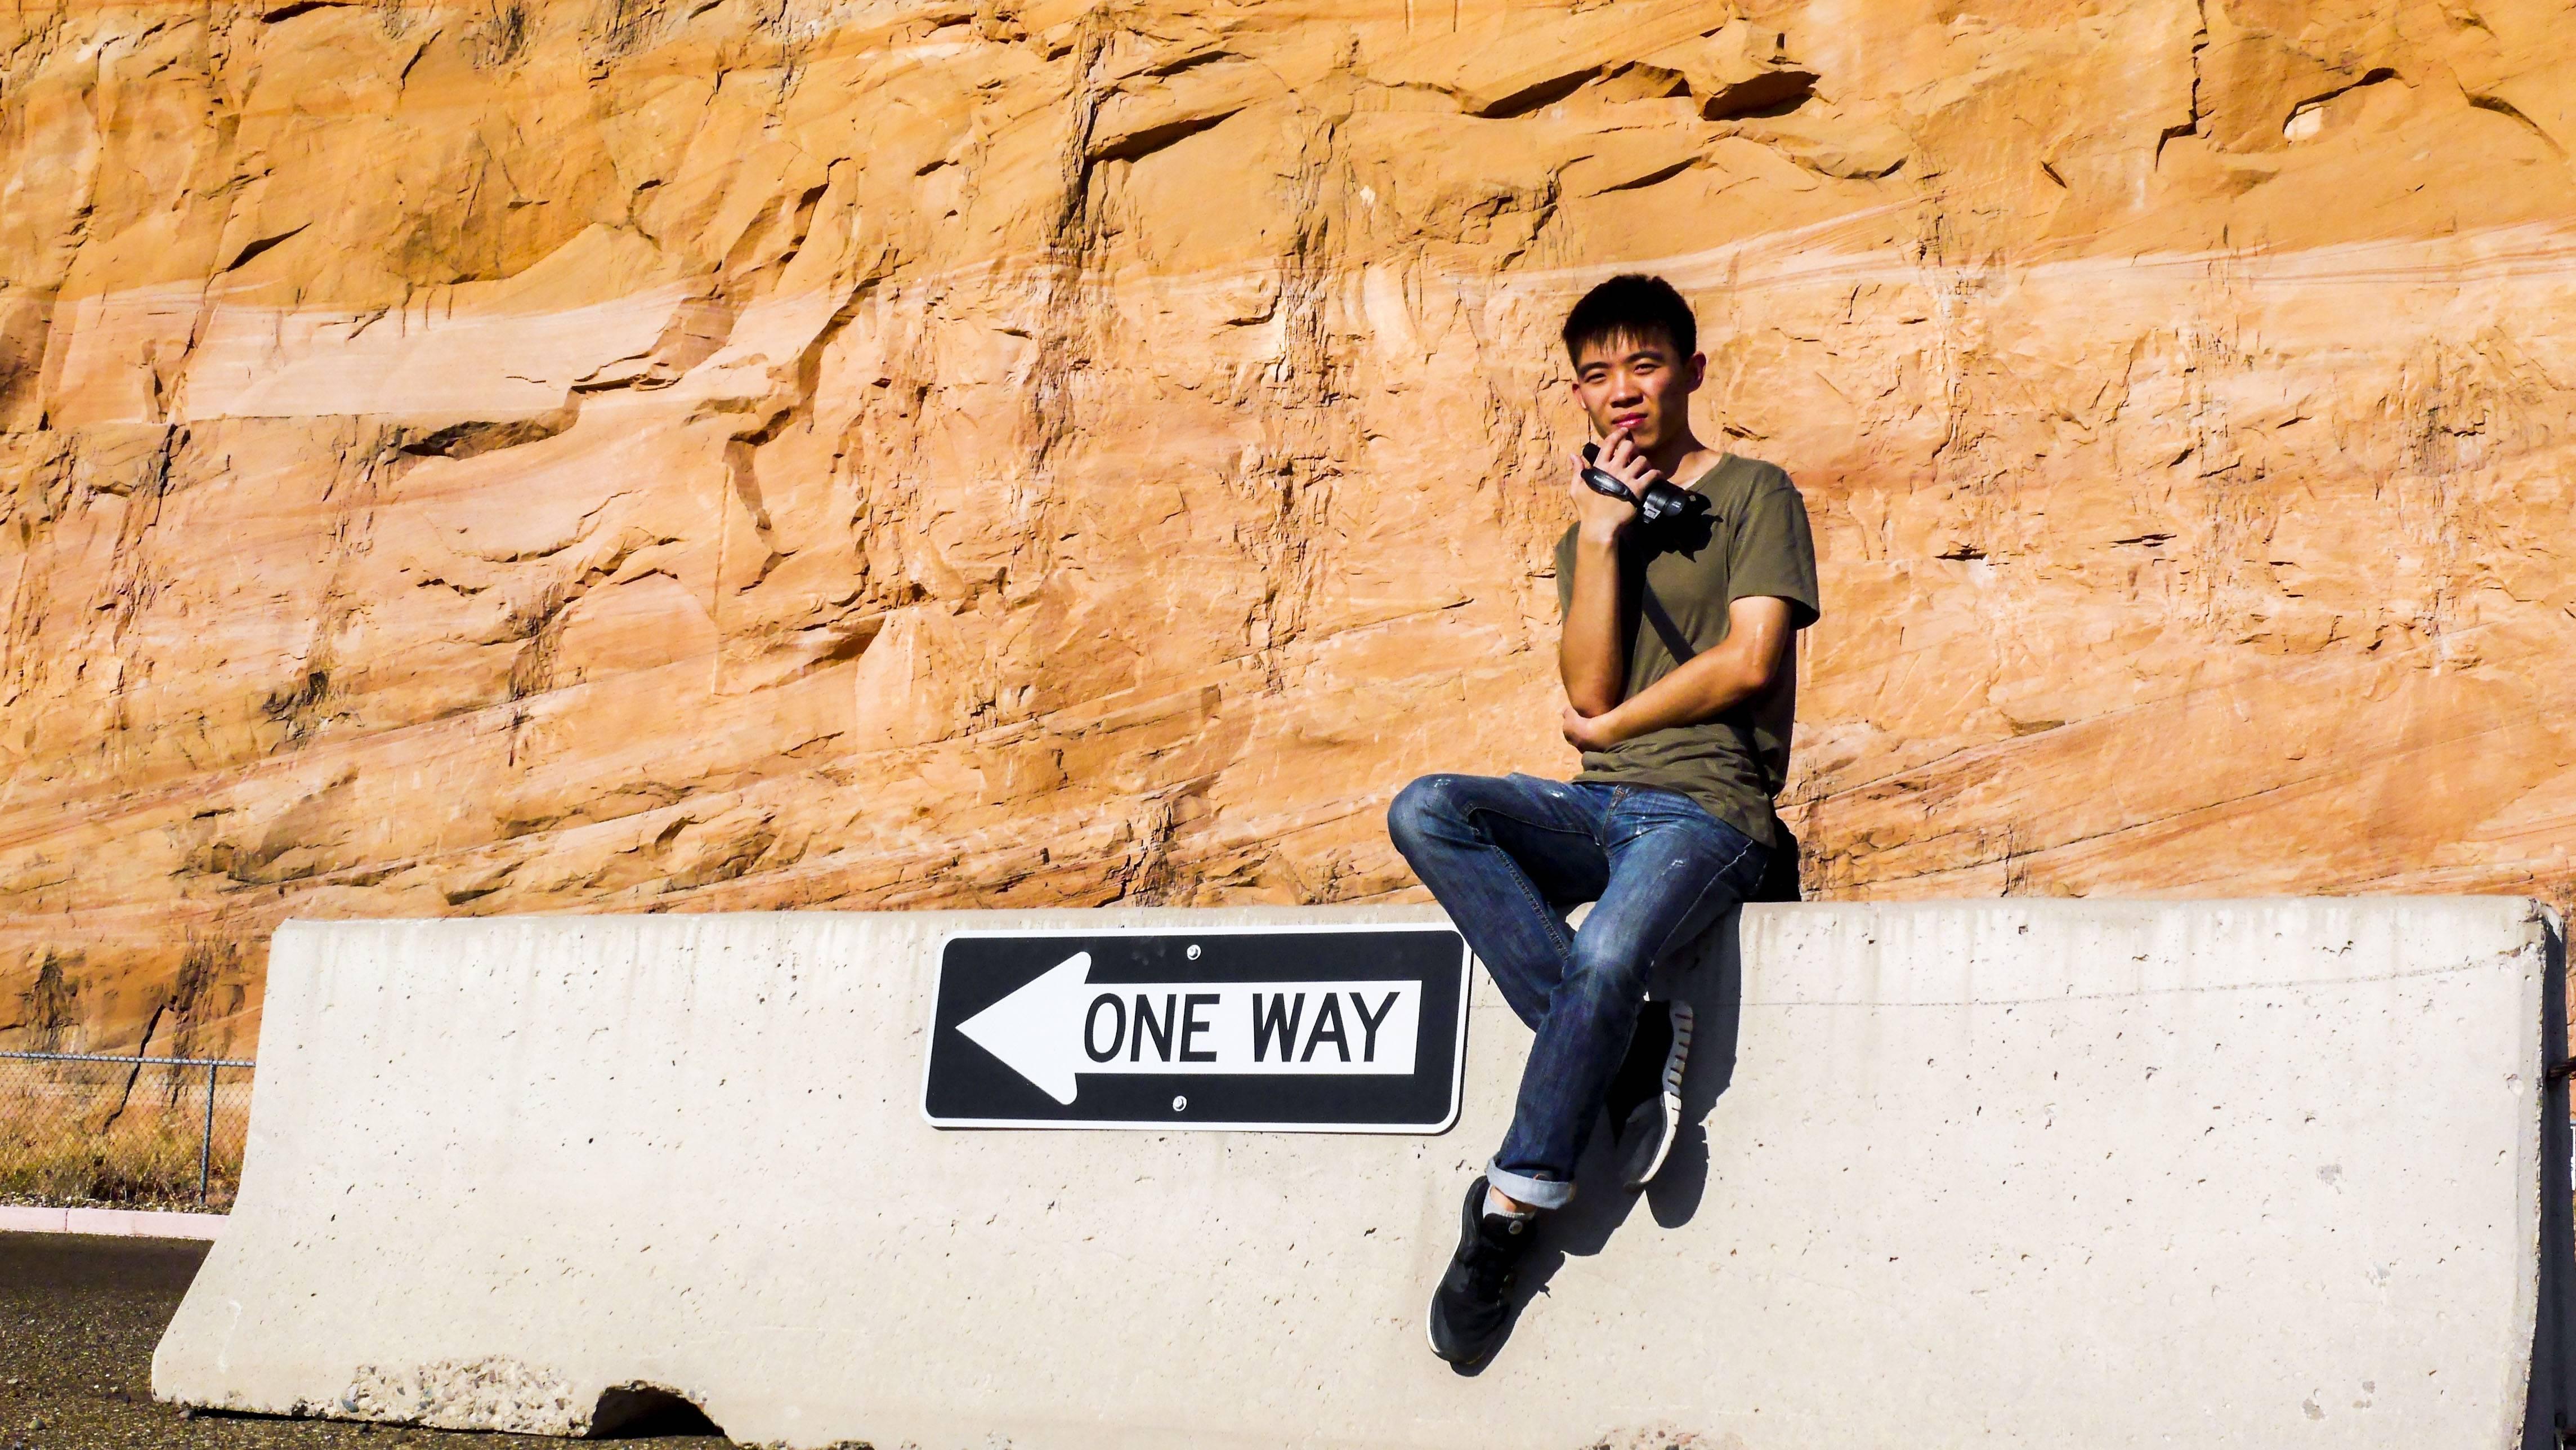 6-Day Bus Tour to Yosemite, Grand Canyon, Antelope Canyon, Zion, Bryce, Las Vegas, Los Angeles from San Francisco